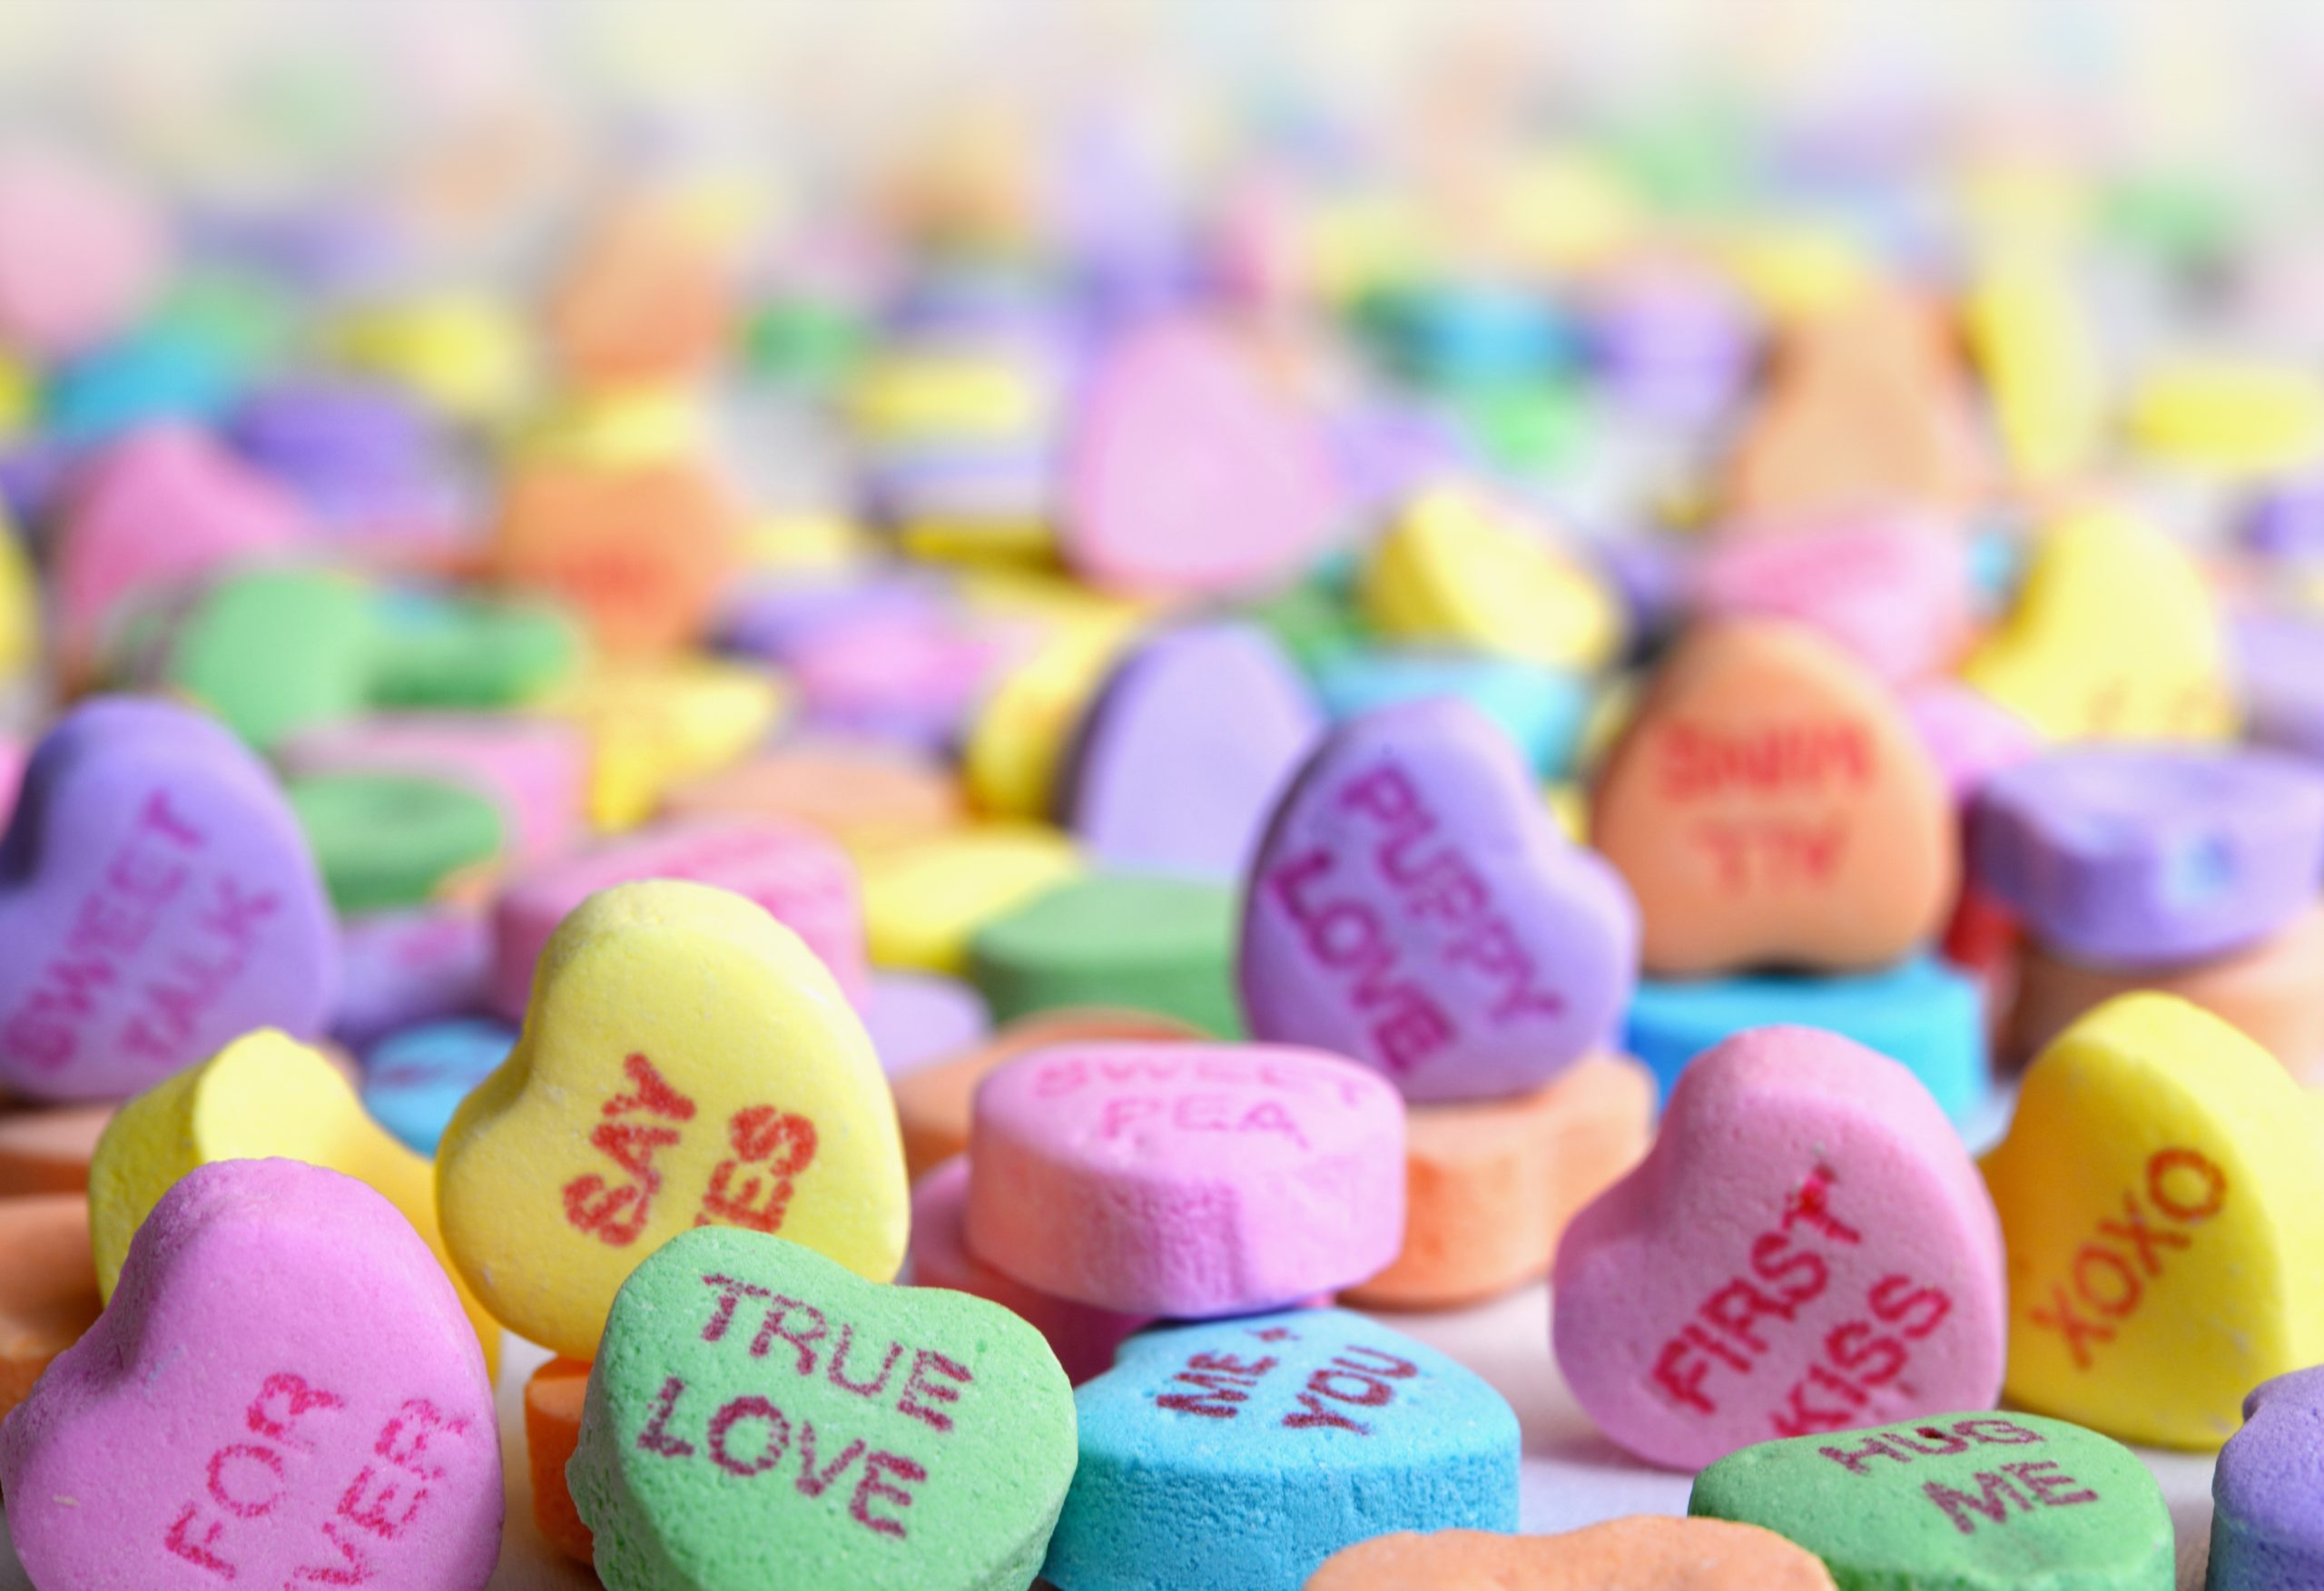 Cheap Valentine's Day dates, ideas